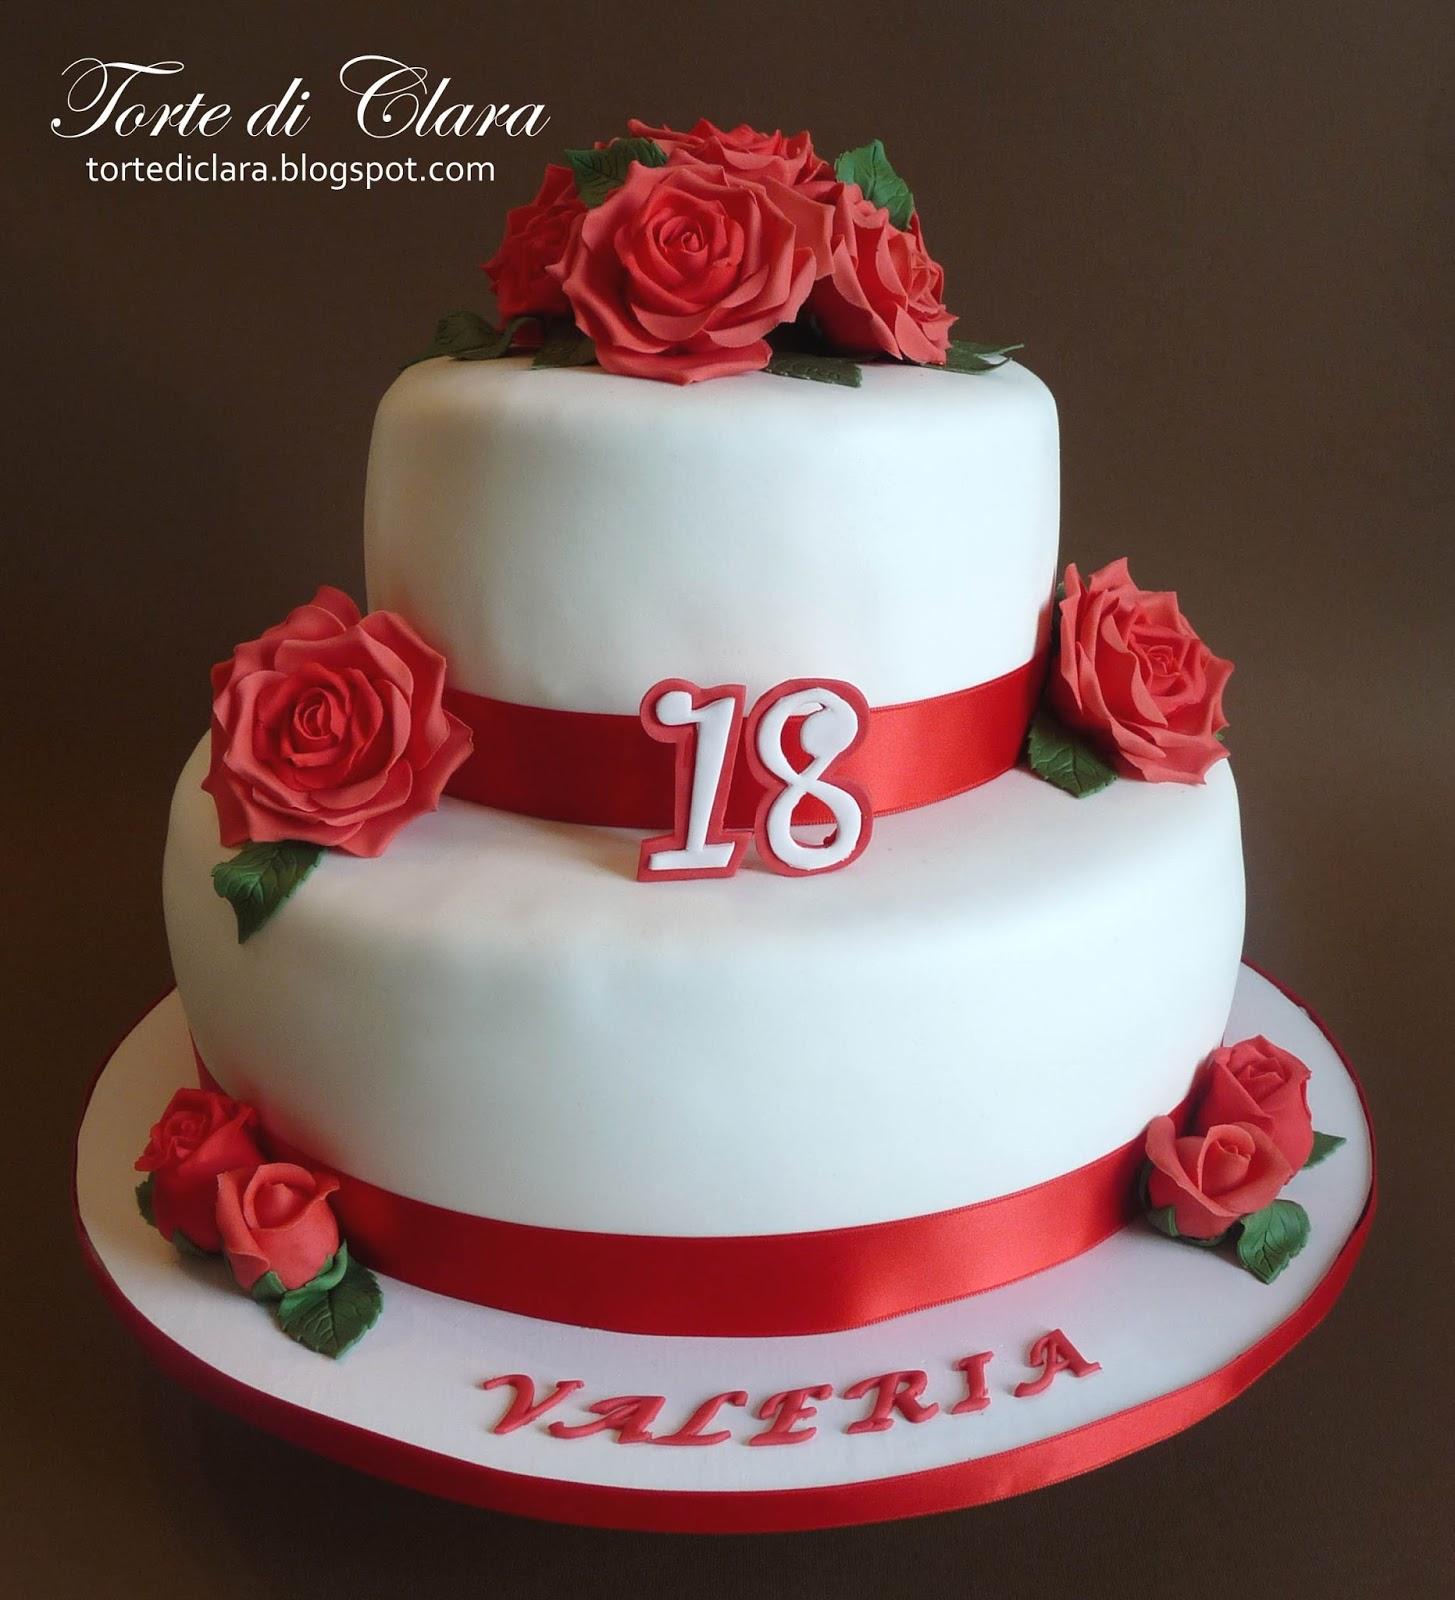 Torte di clara novembre 2014 for Torte per 18 anni maschile